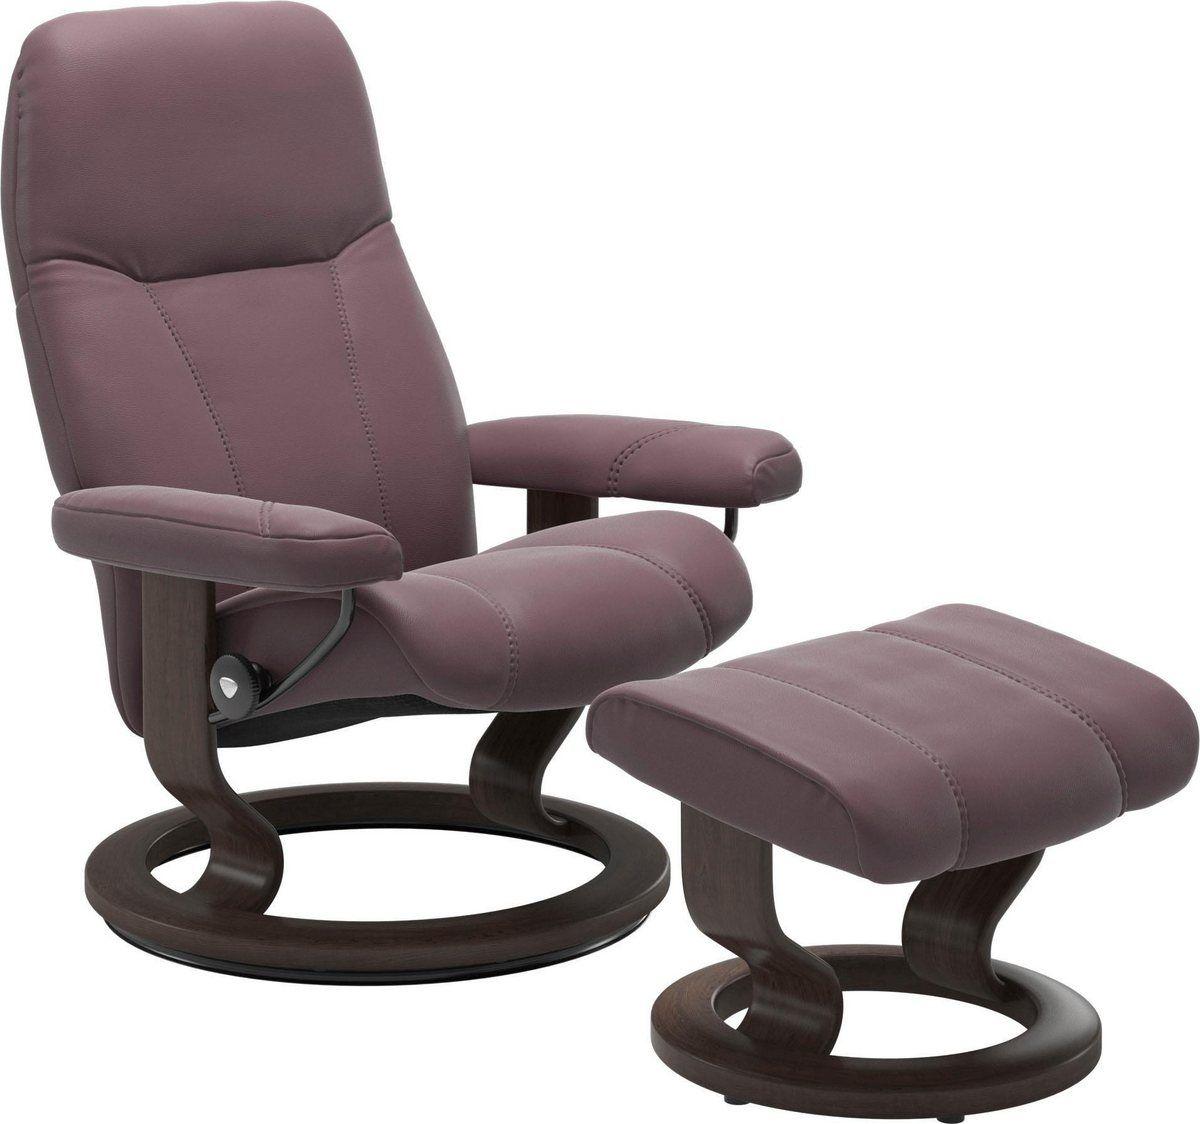 Stressless® Relaxsessel »Consul« (Set), mit Hocker, mit